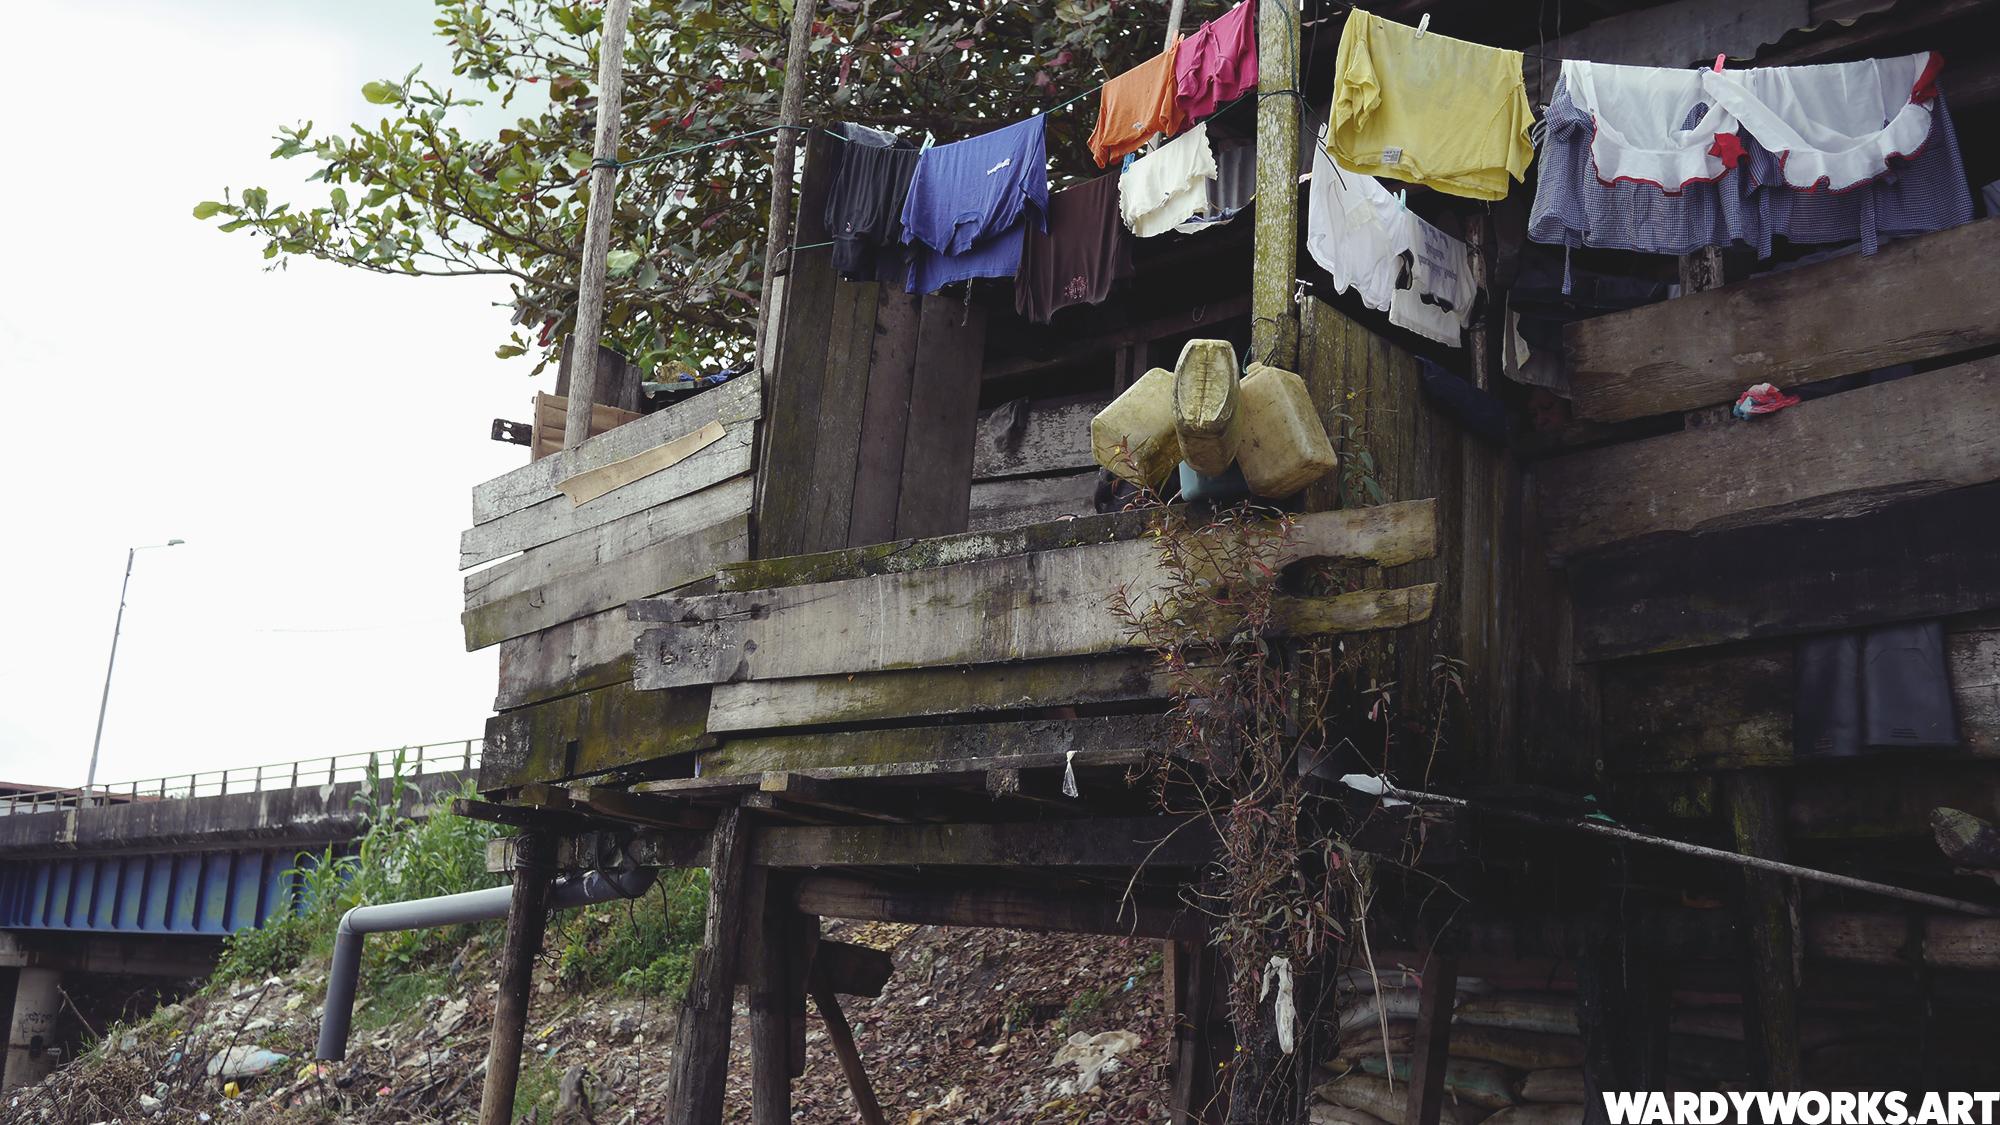 Wardyworks_Iquitos-River-Huts.jpg